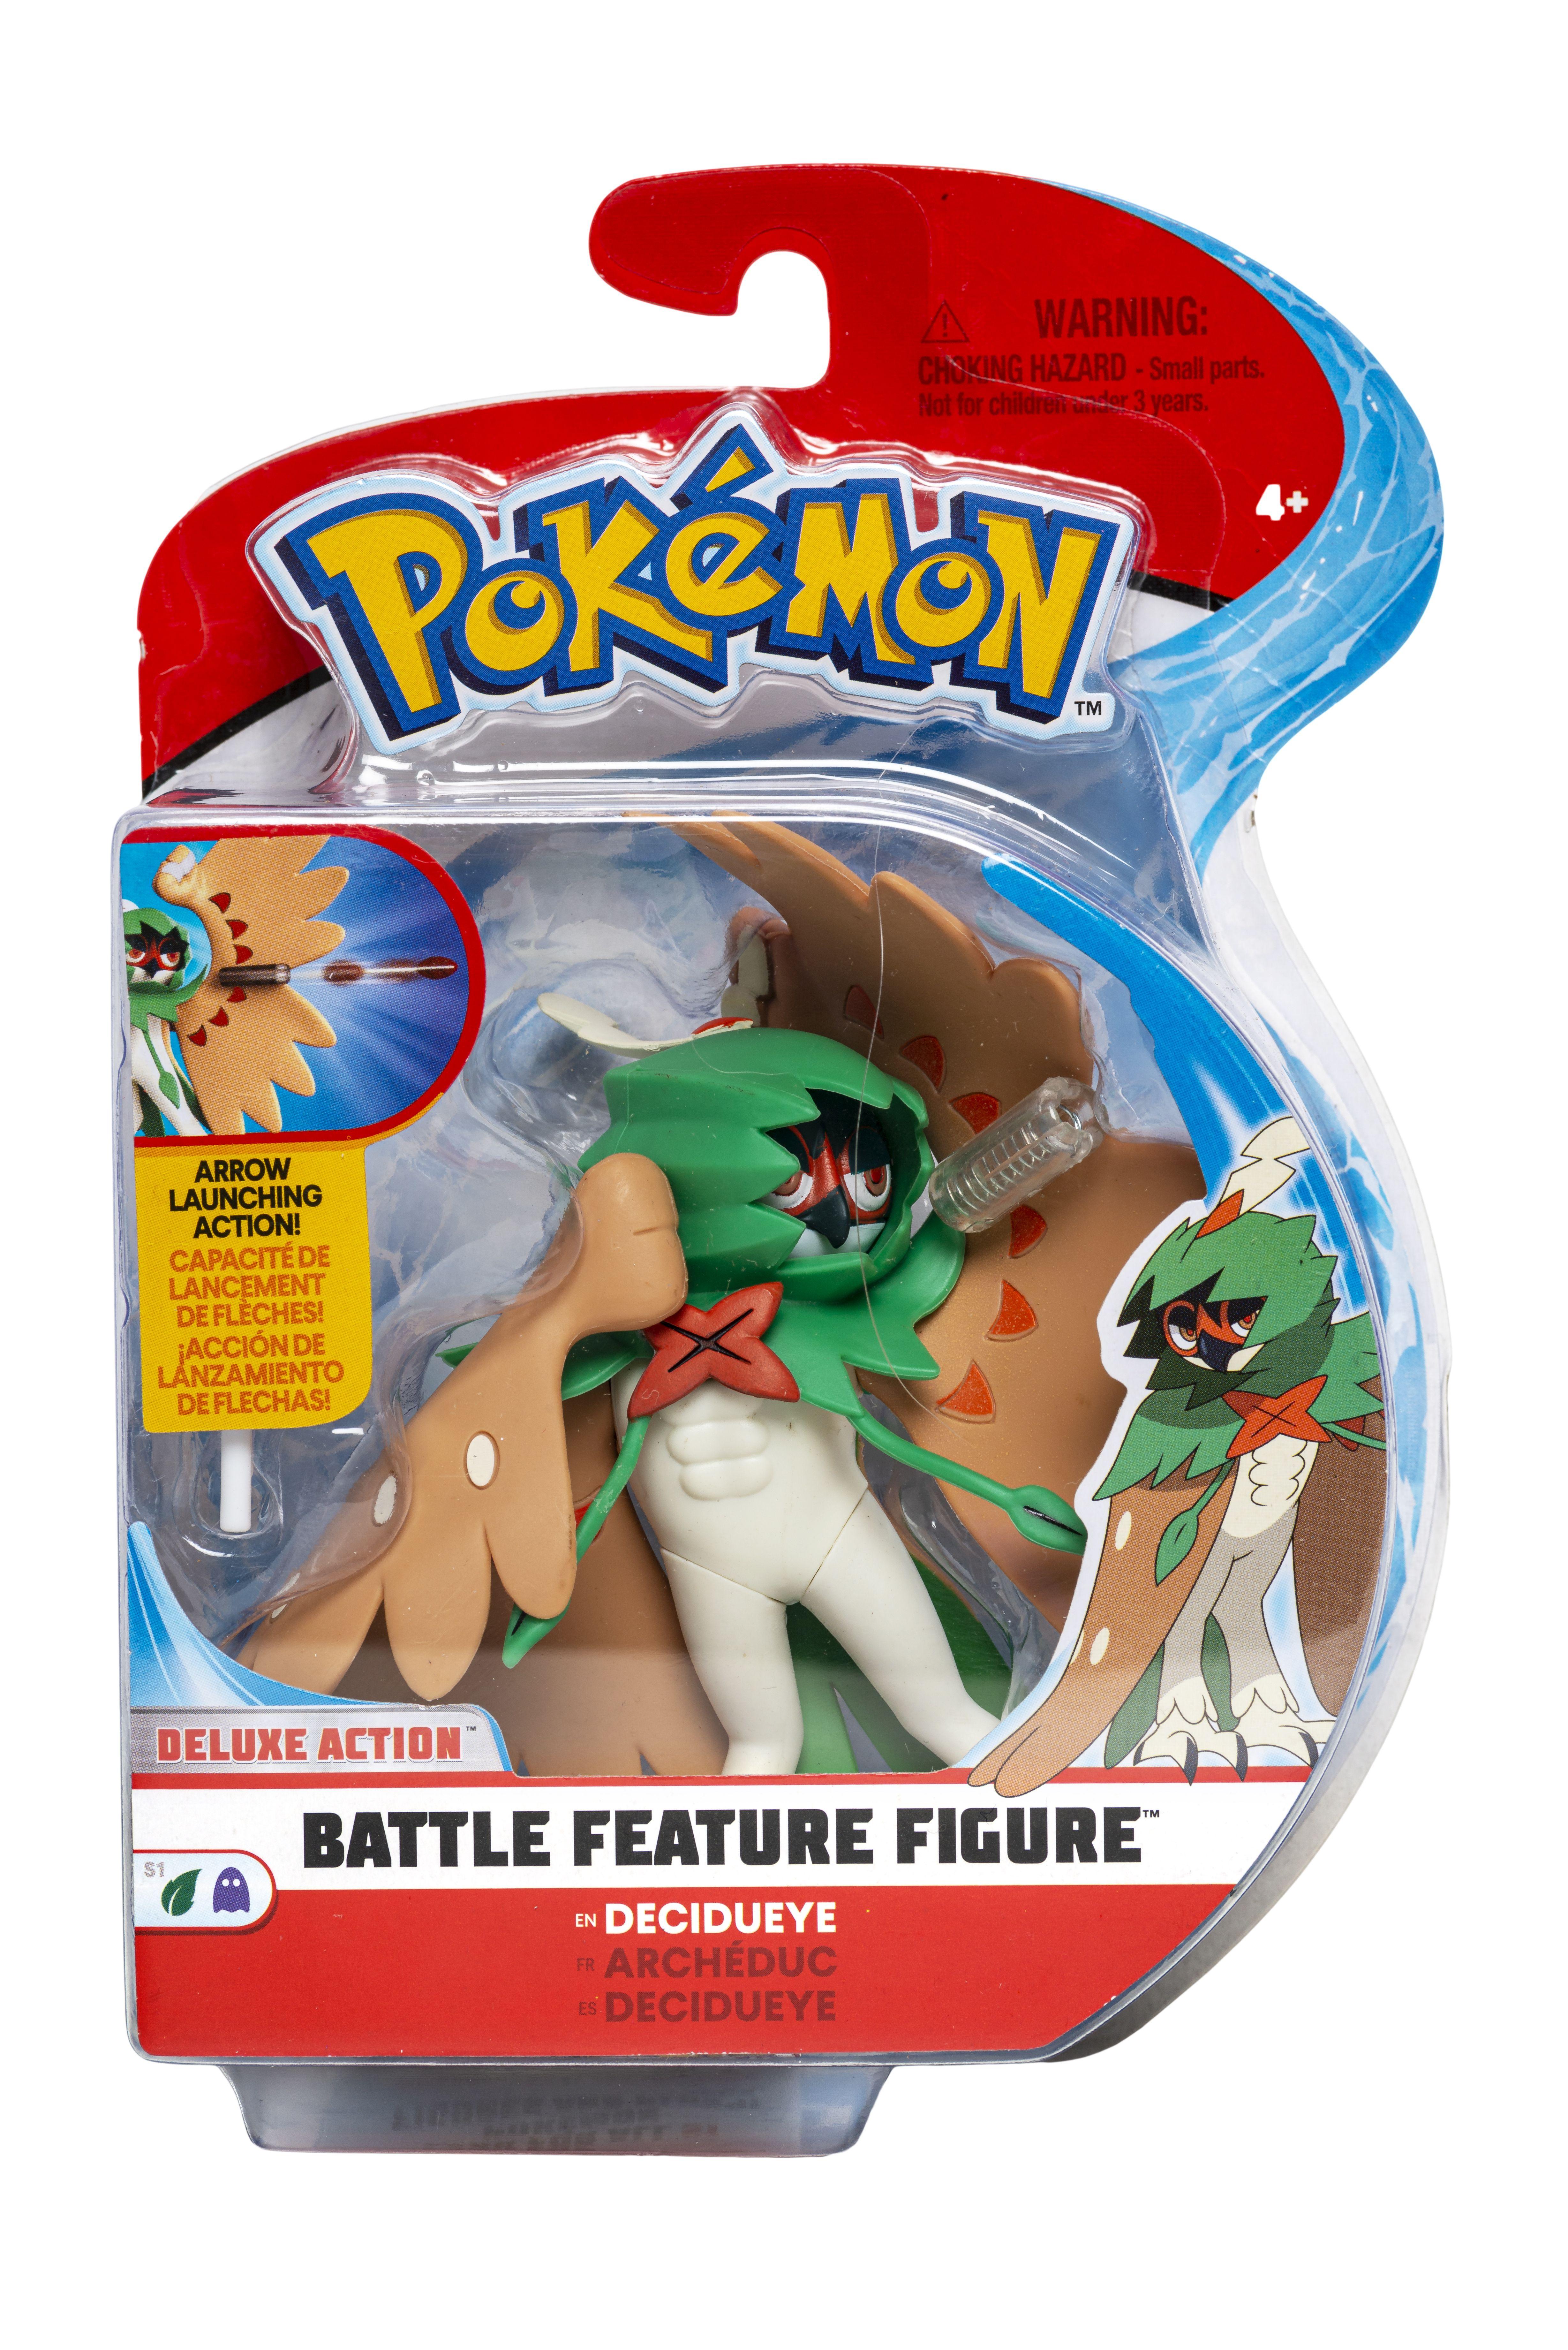 Pokémon - Battle Feature Figur - Decidueye